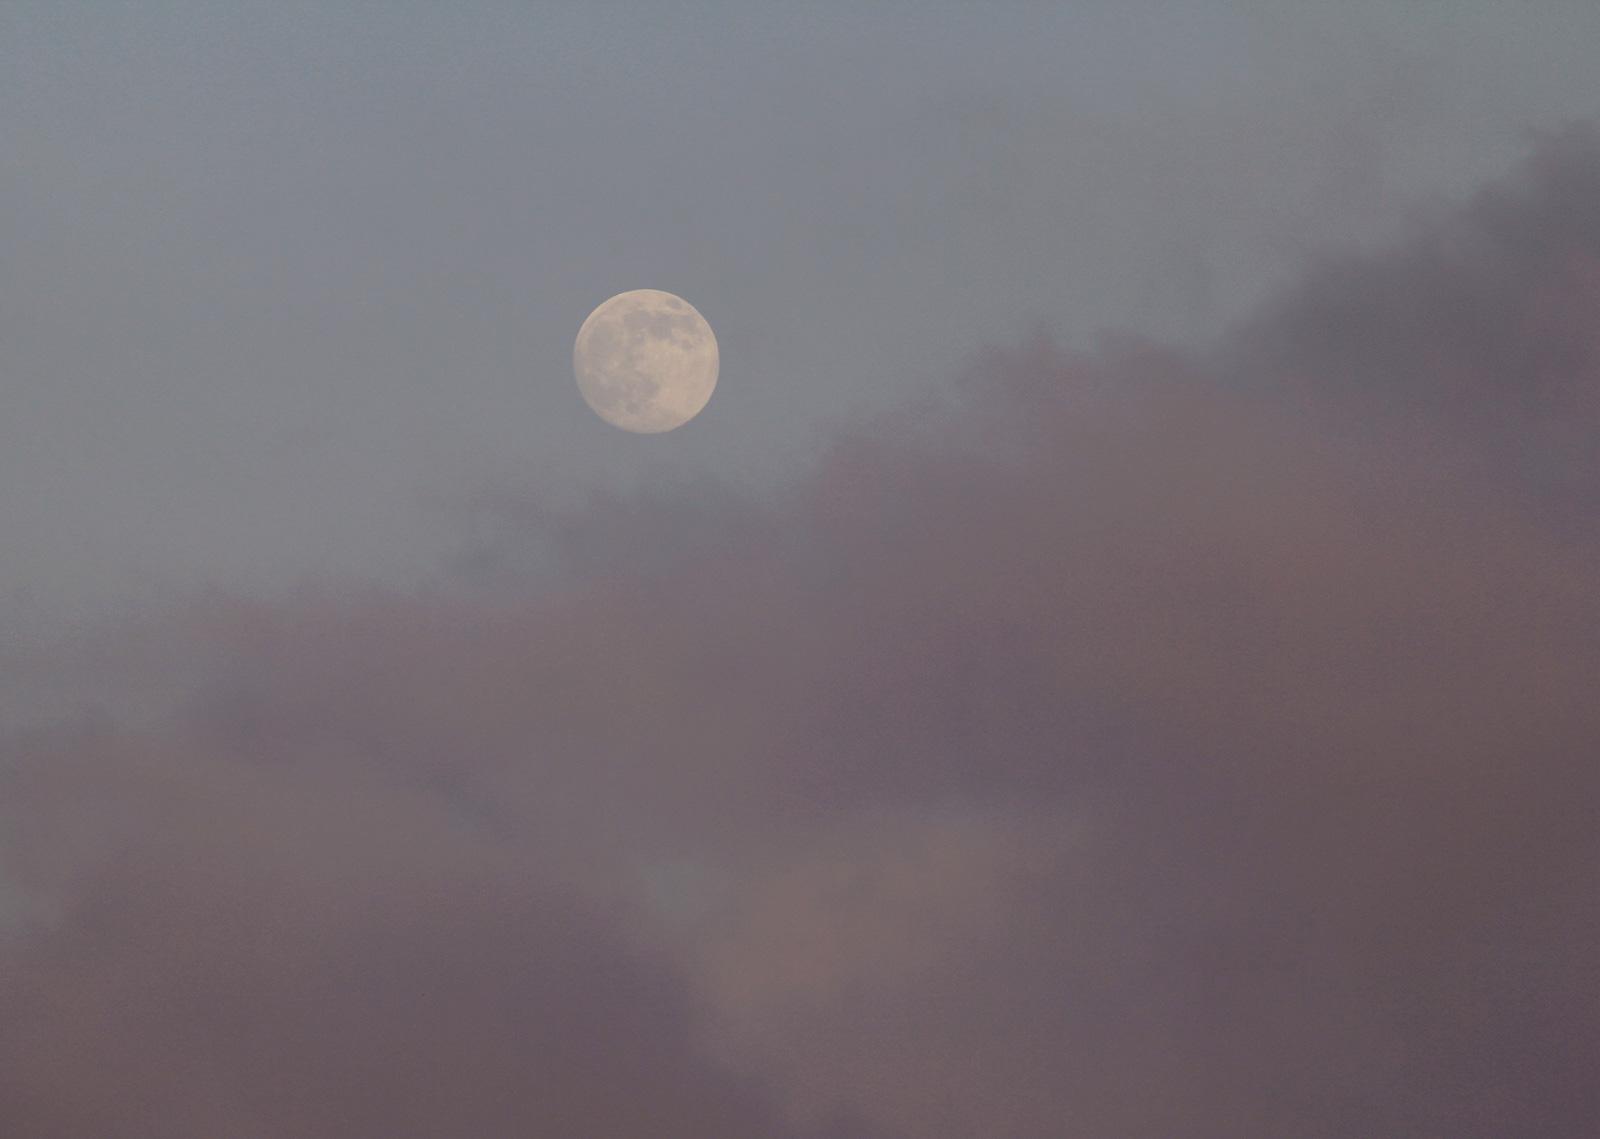 bland-molnen-03